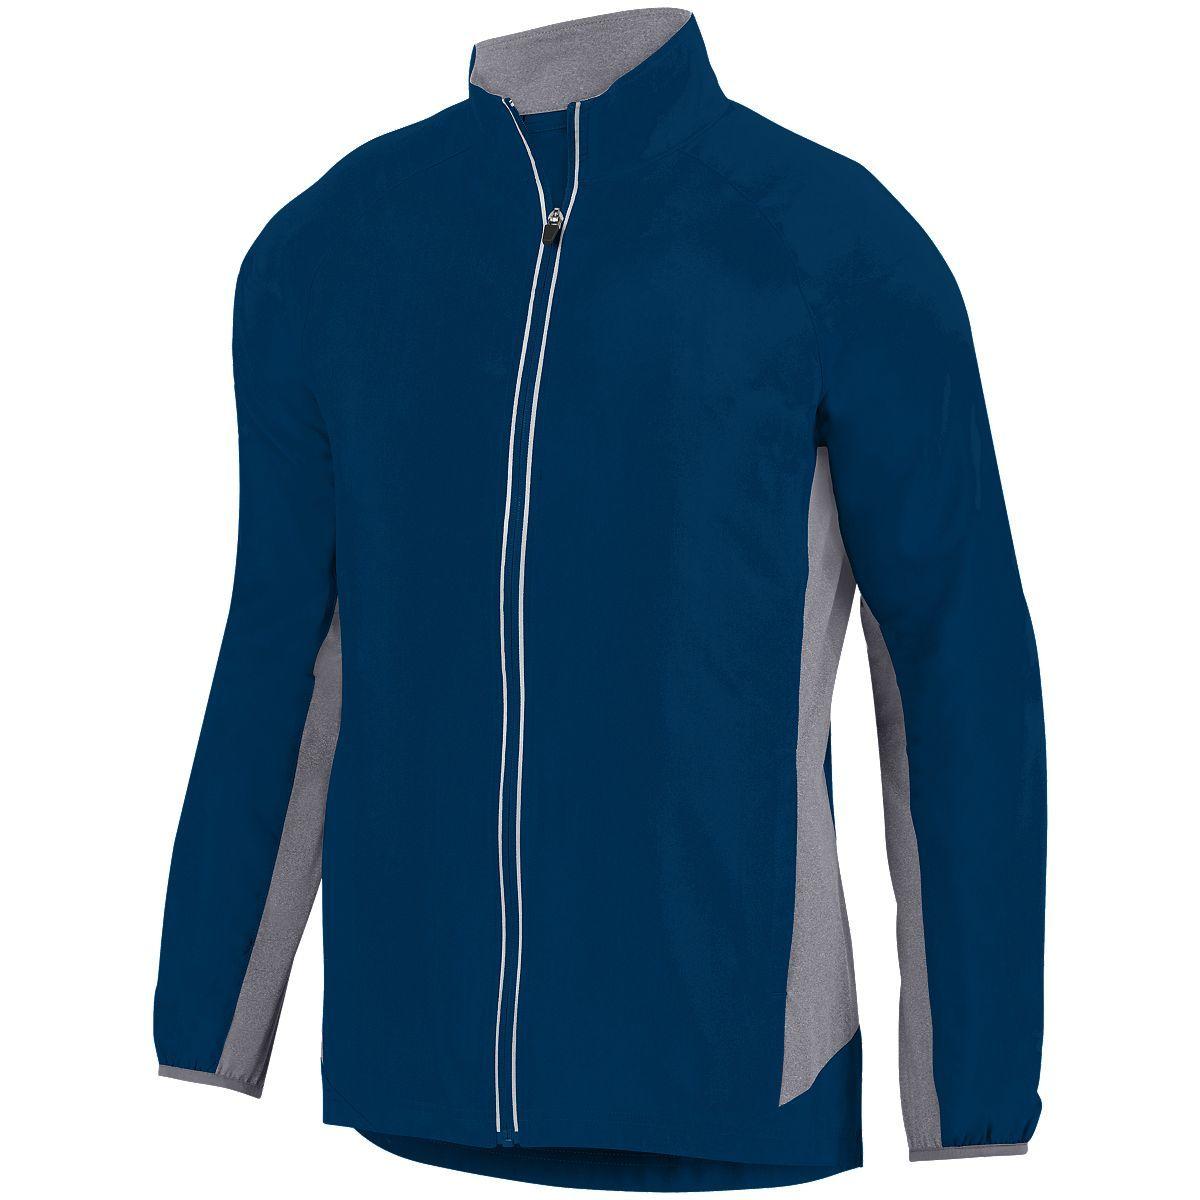 Preeminent Jacket - NAVY/GRAPHITE HEATHER